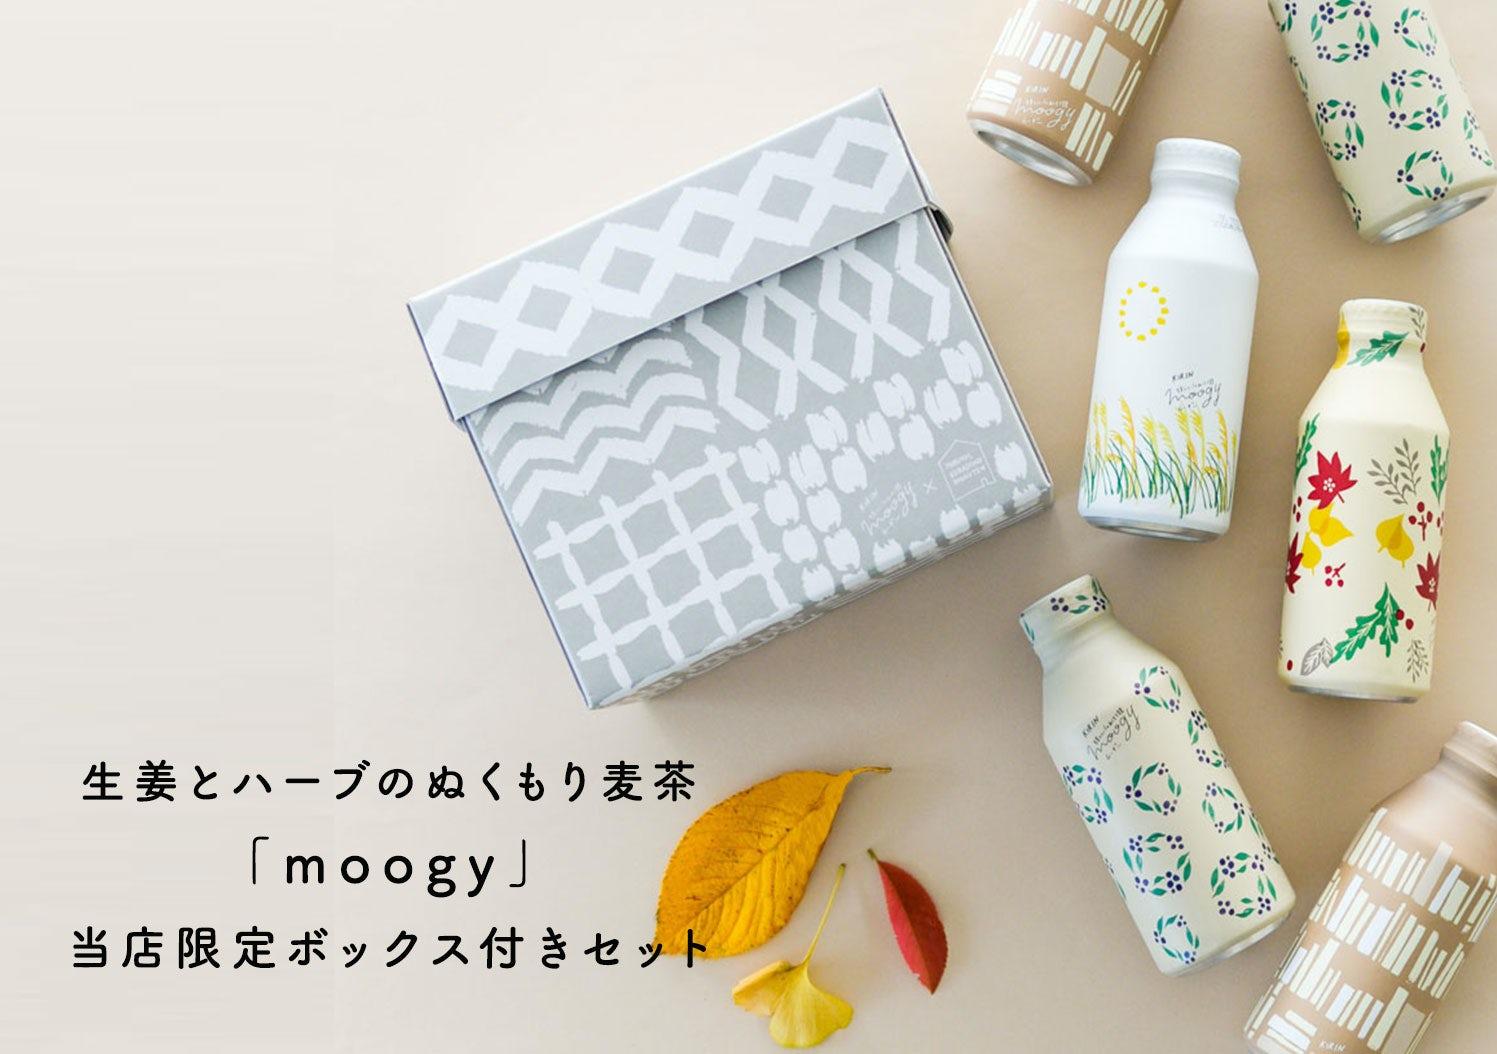 moogy / 当店限定ボックス付き6本入りセットの画像